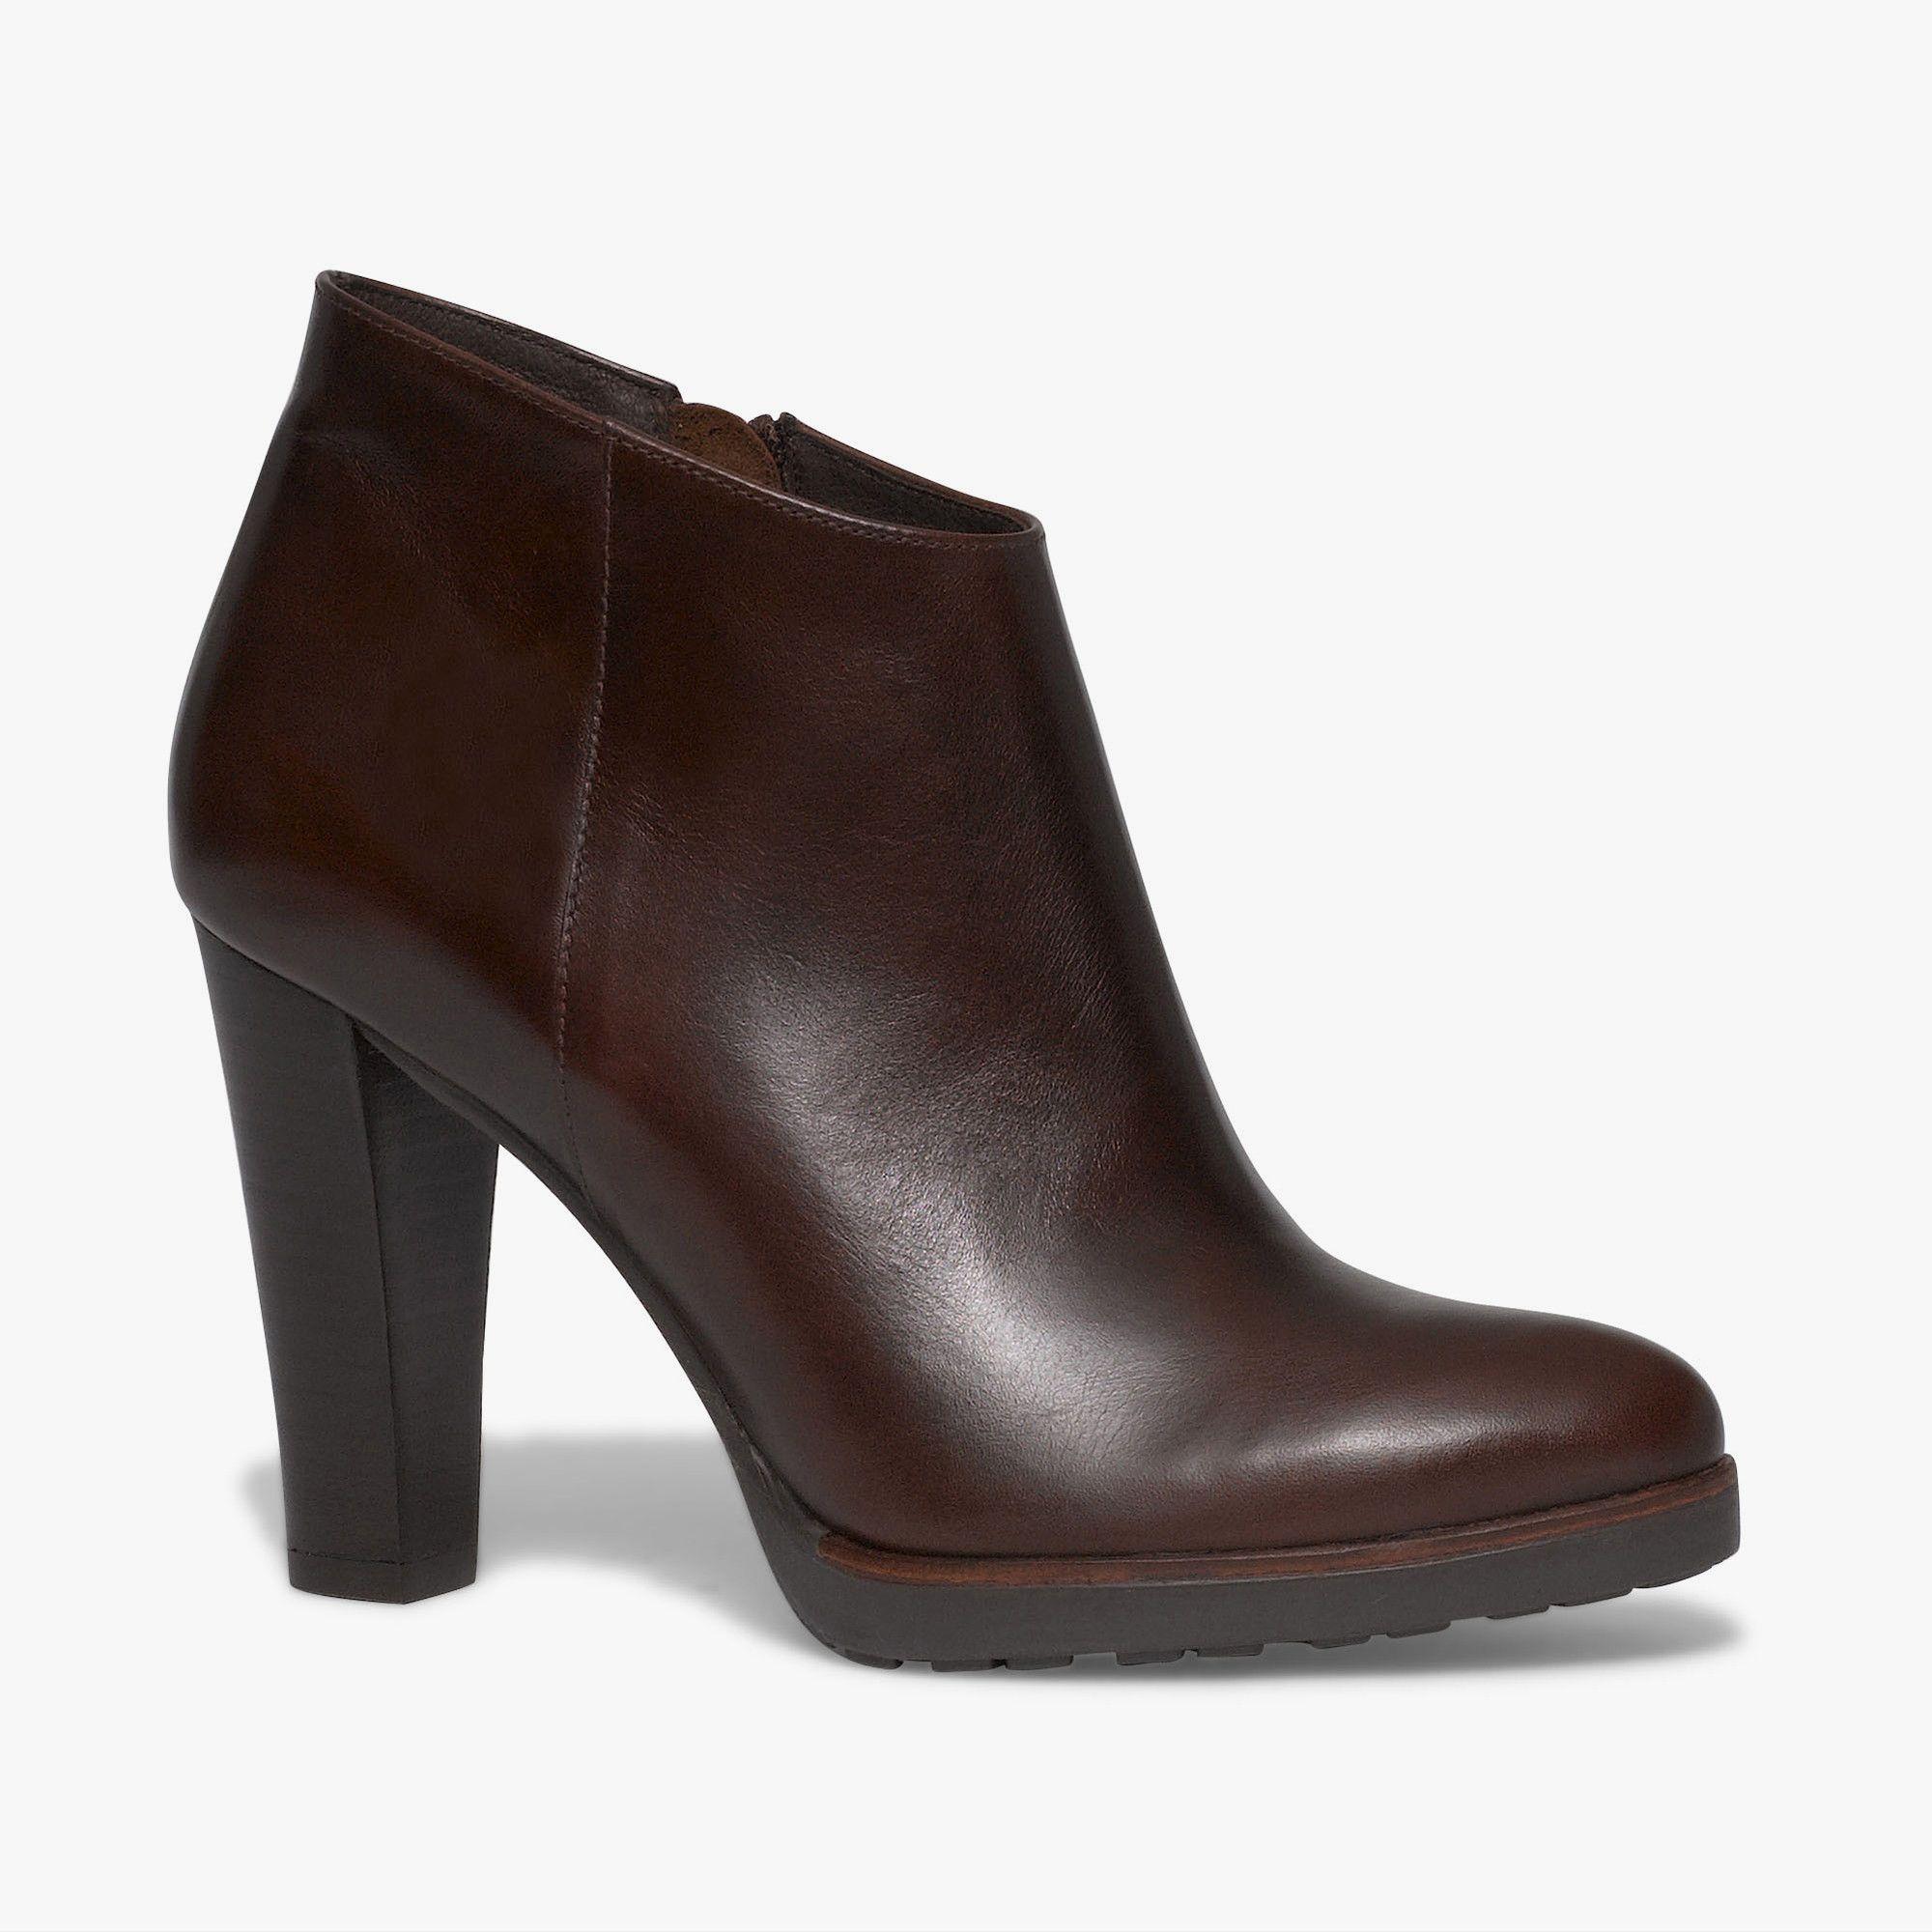 Boots marron talon haut en cuir